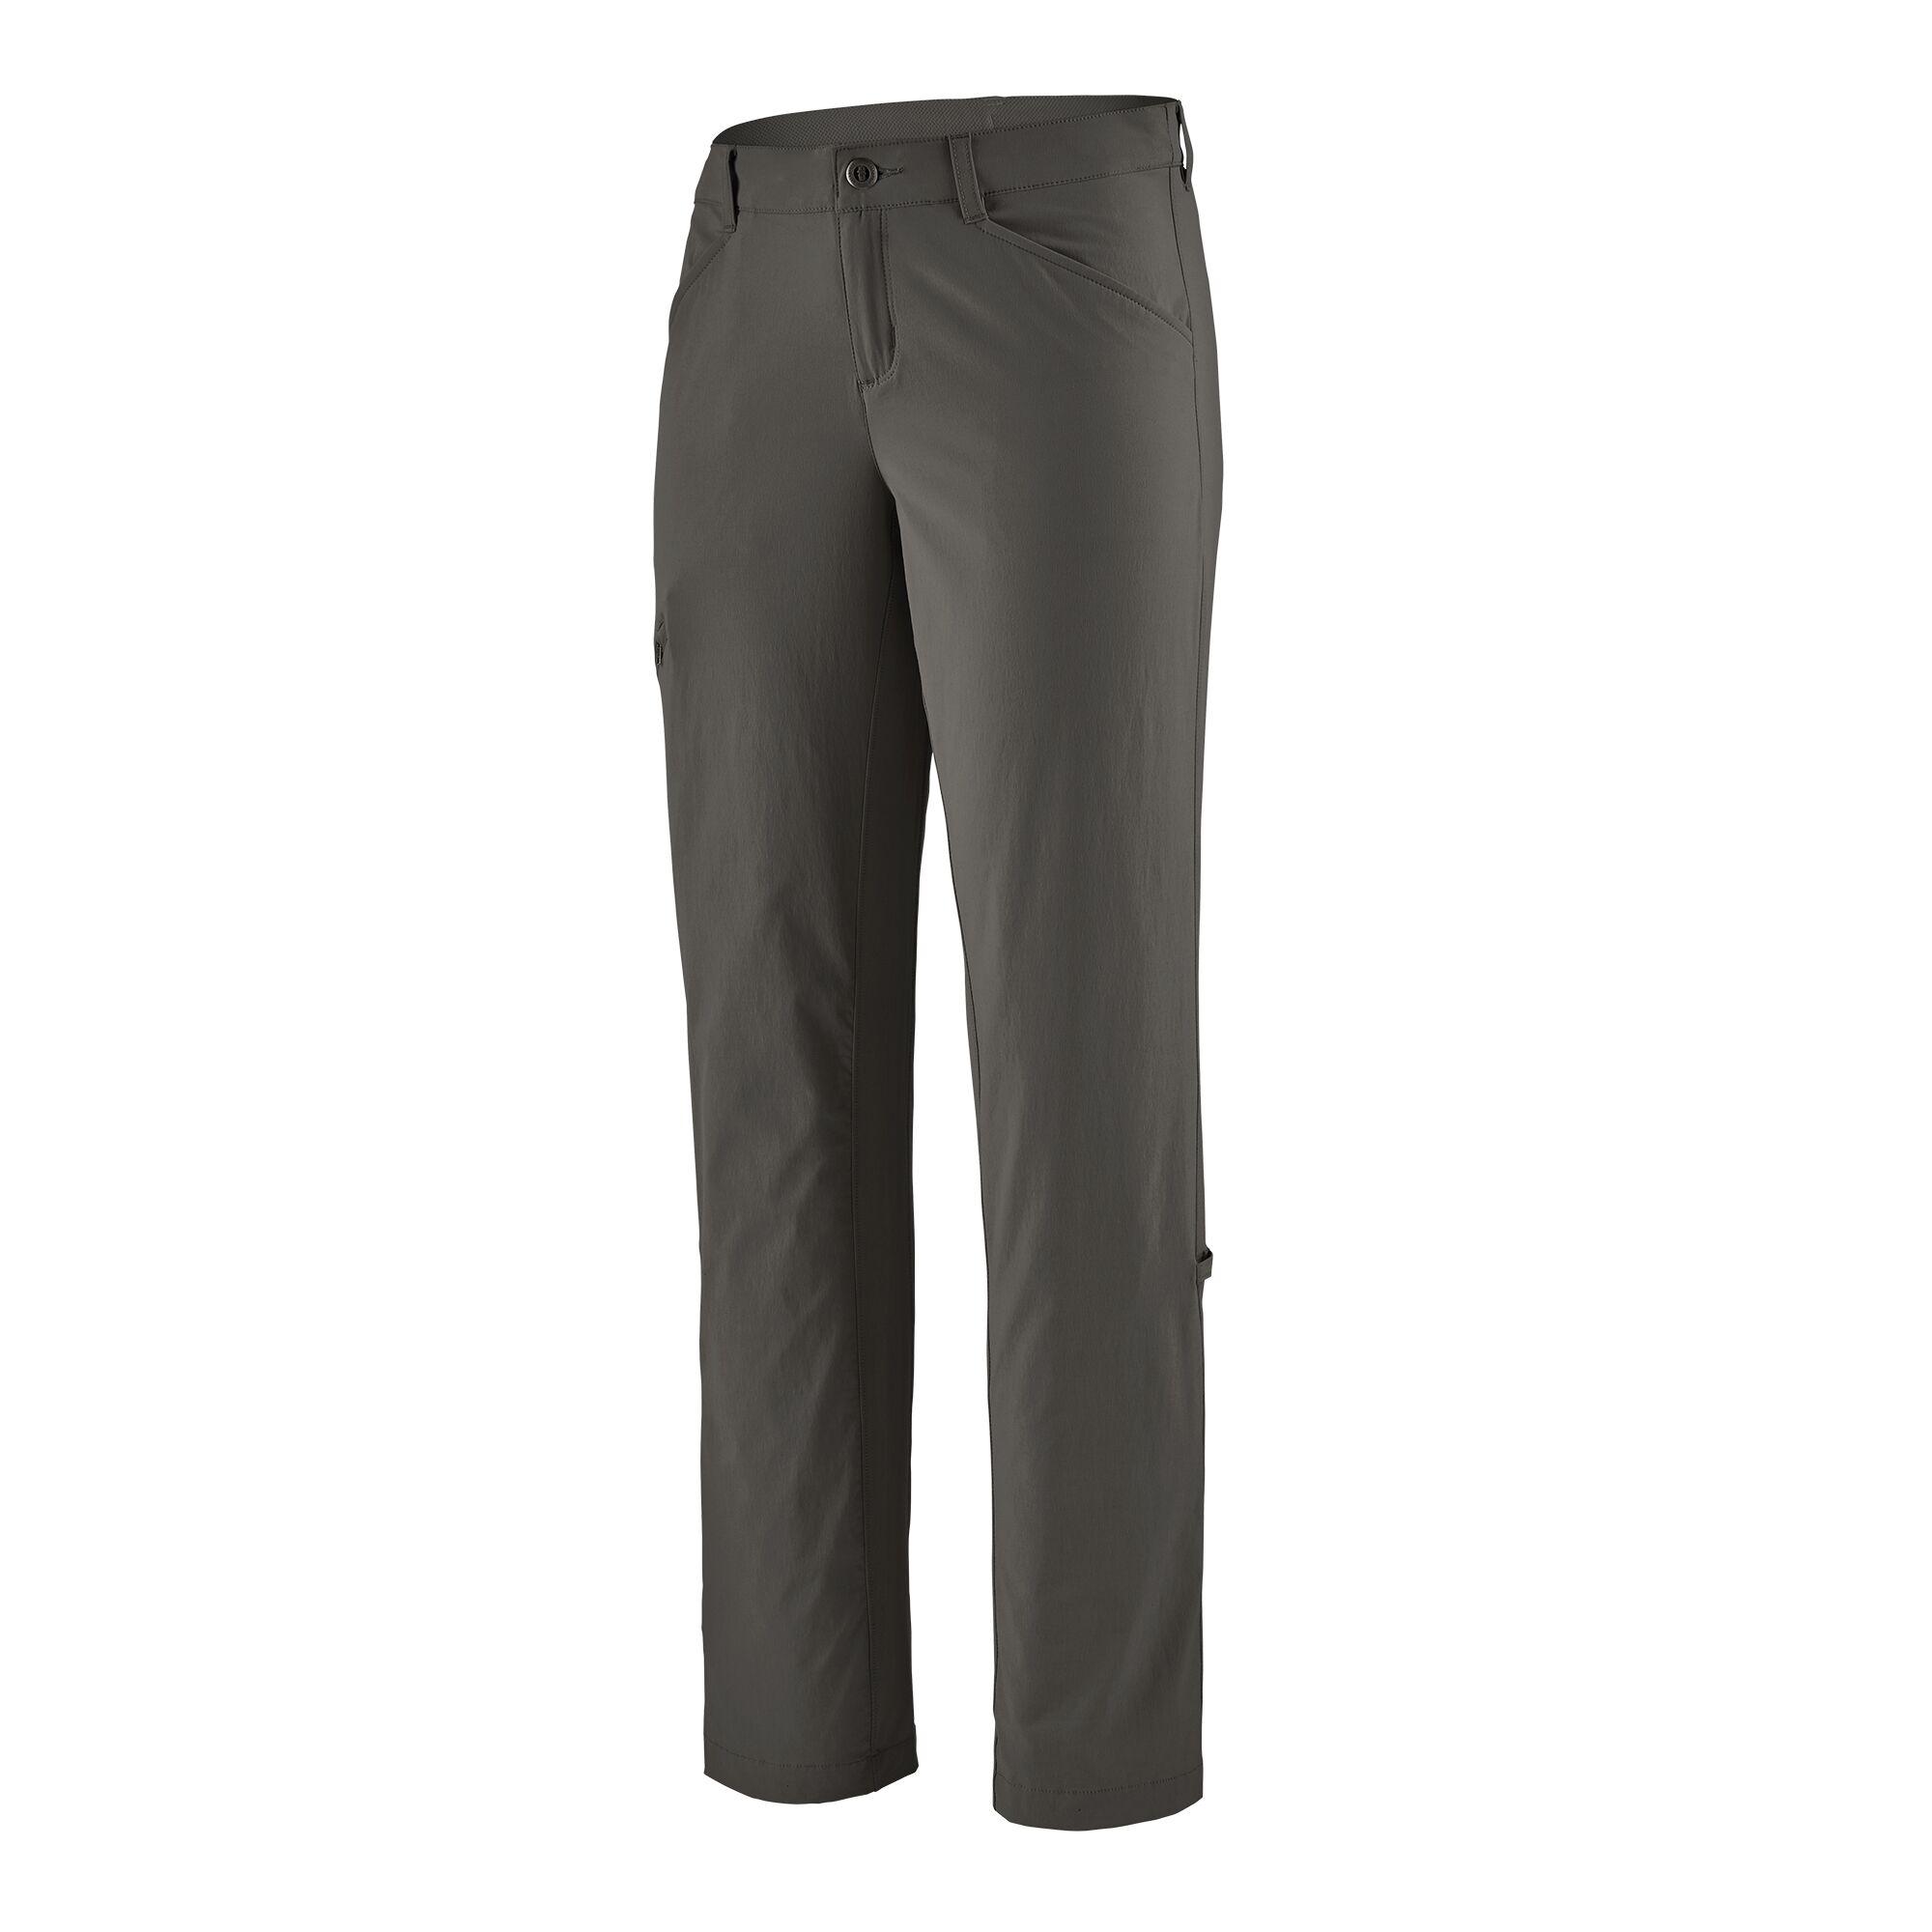 Quandary Pant Short - Women's